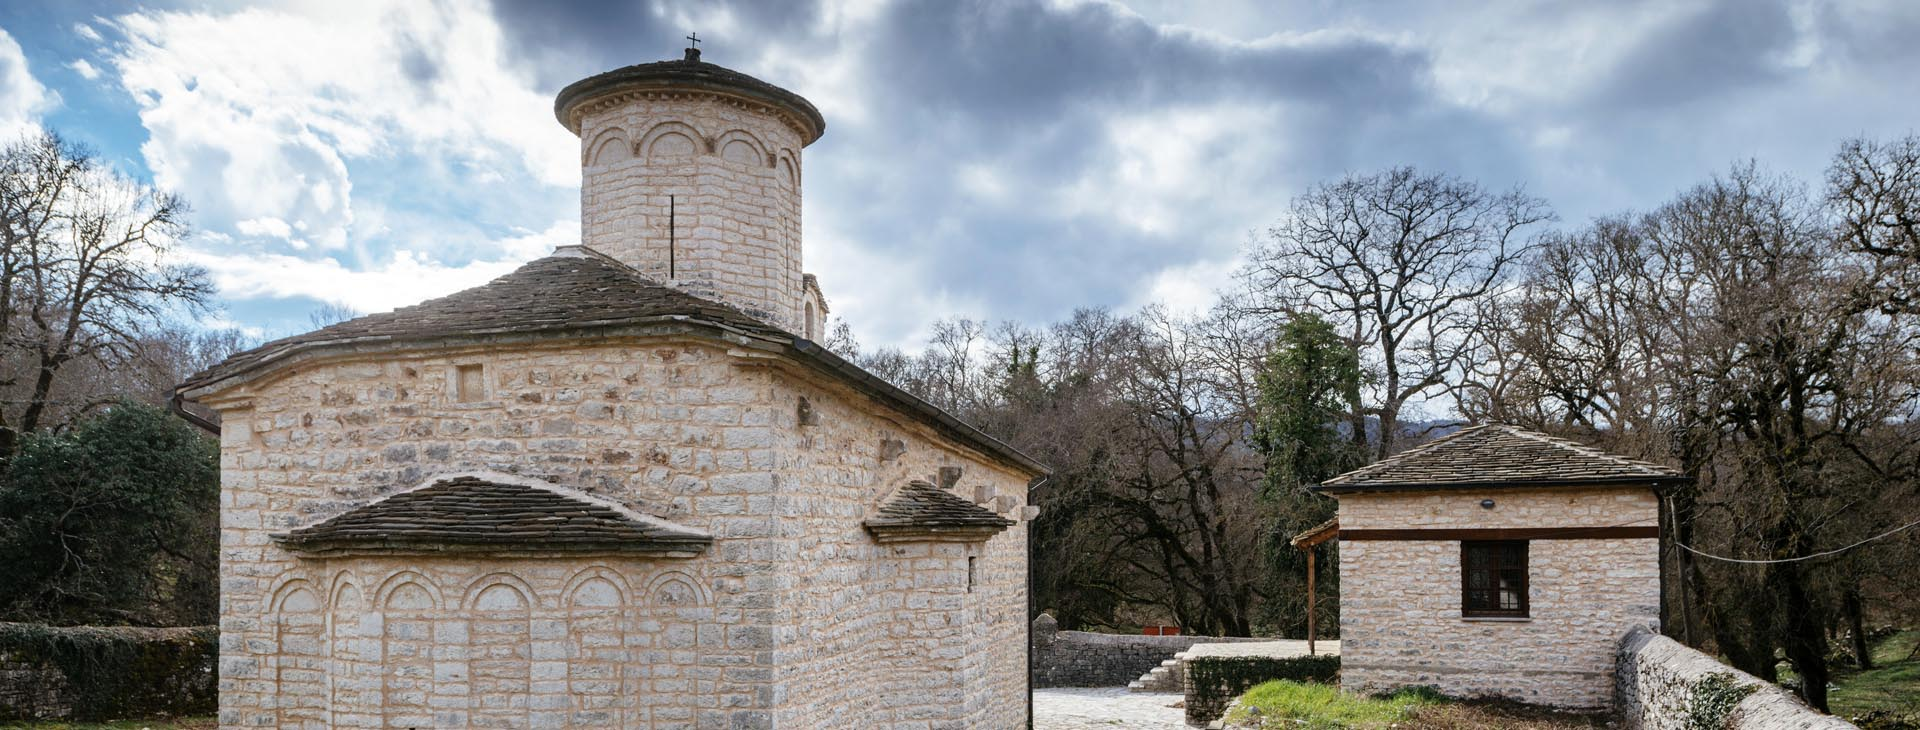 Avel Monastery, Ioannina